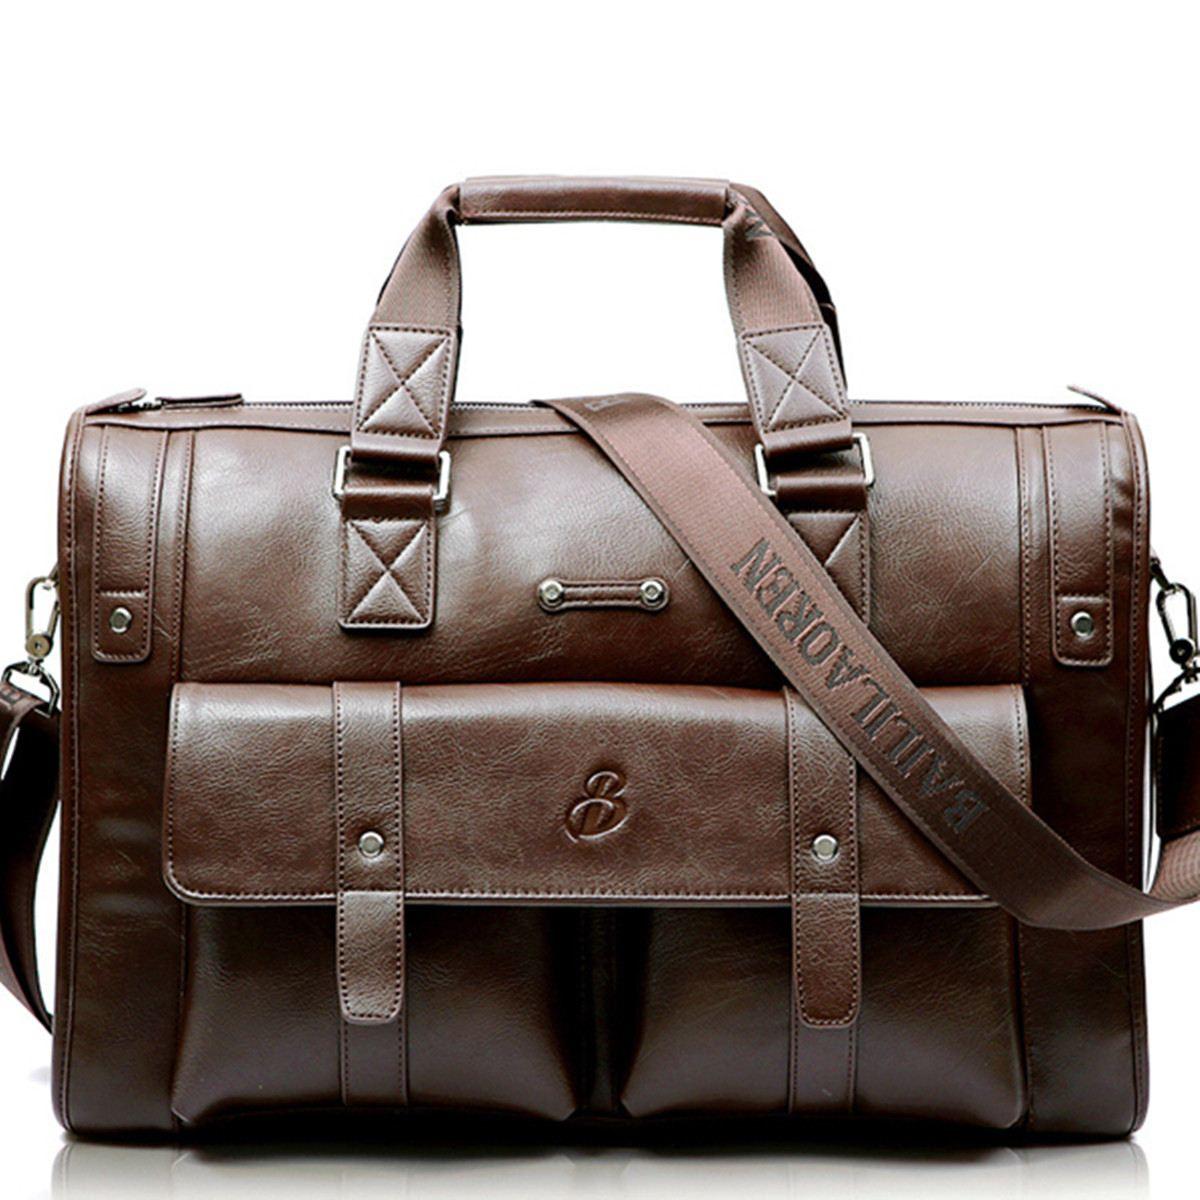 High Capacity Men Briefcase Business Handbag Leather Messenger Handbags Men Bags Vintage Laptop Shoulder Bag Men's Travel Bags